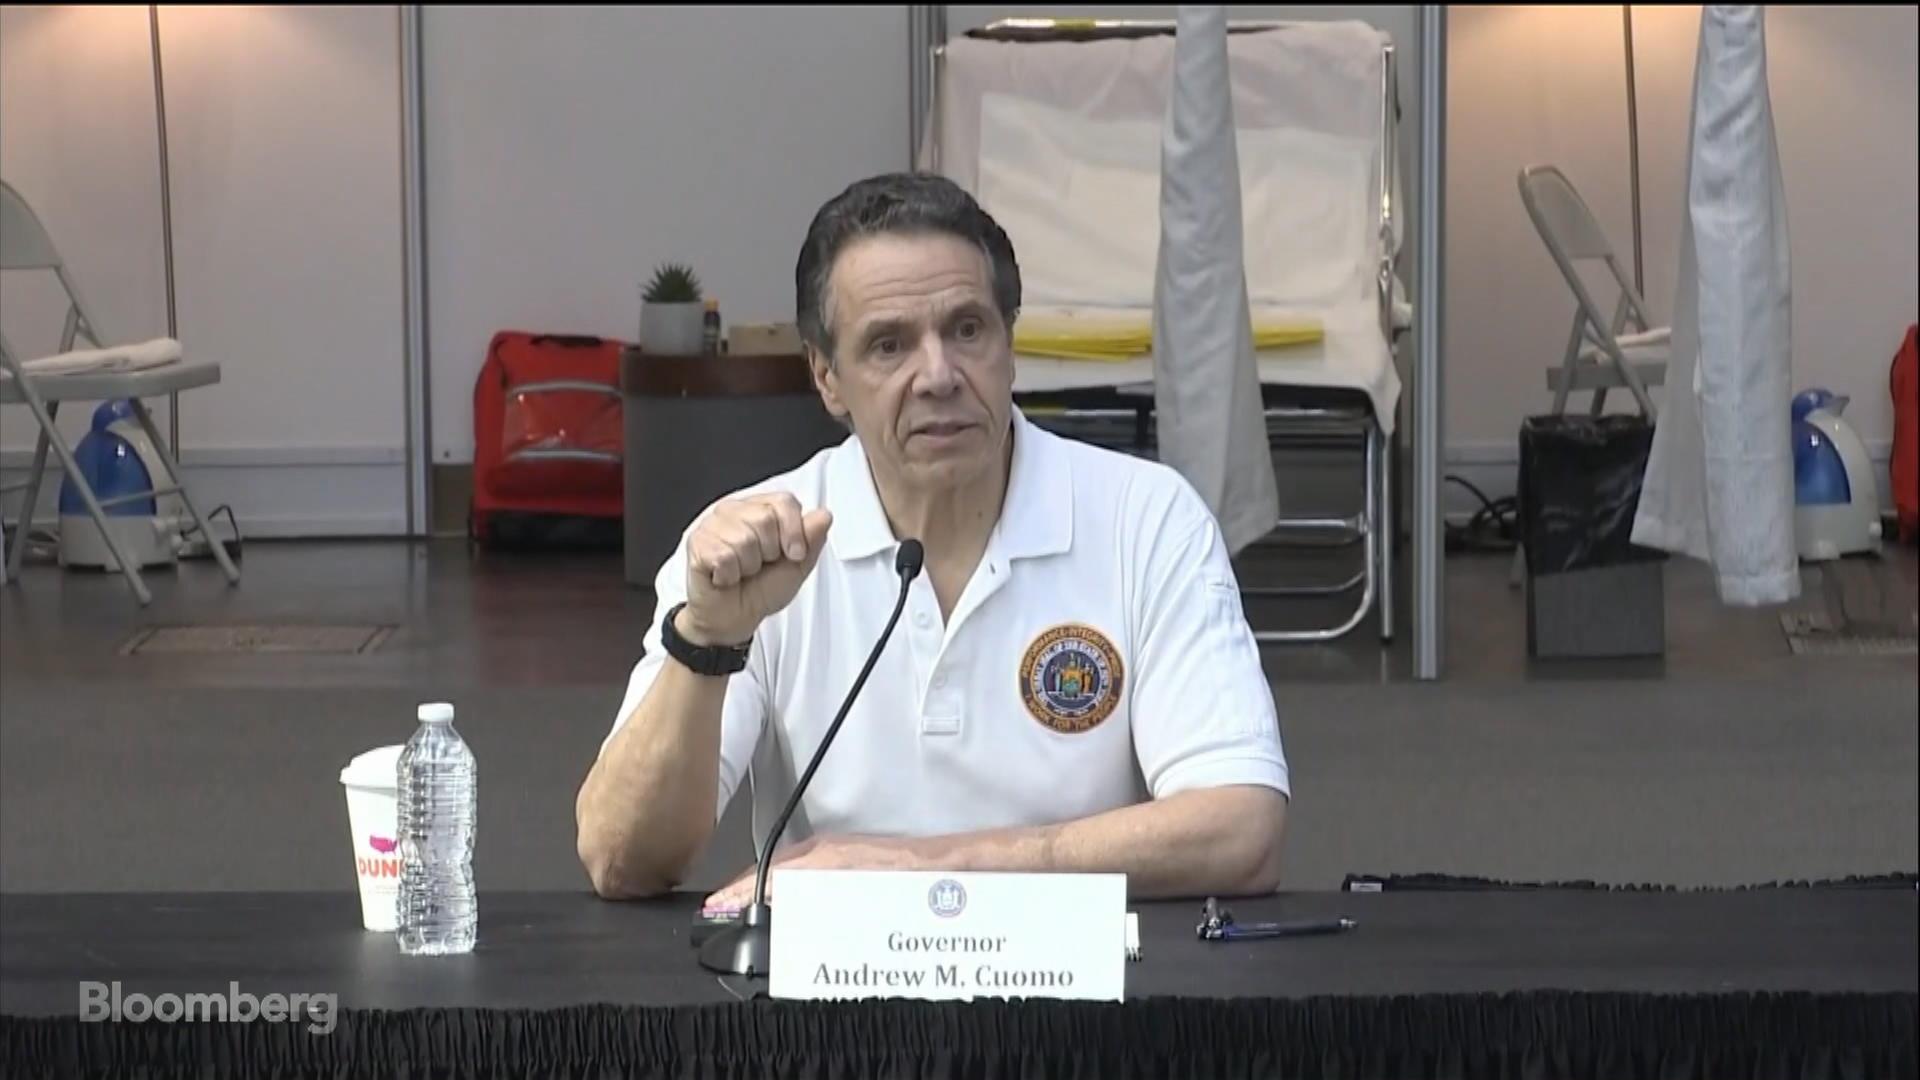 WATCH –  New York Governor Andrew Cuomo Holds Coronavirus Press Briefing, Unveils 1000 Bed Manhattan Field Hospital